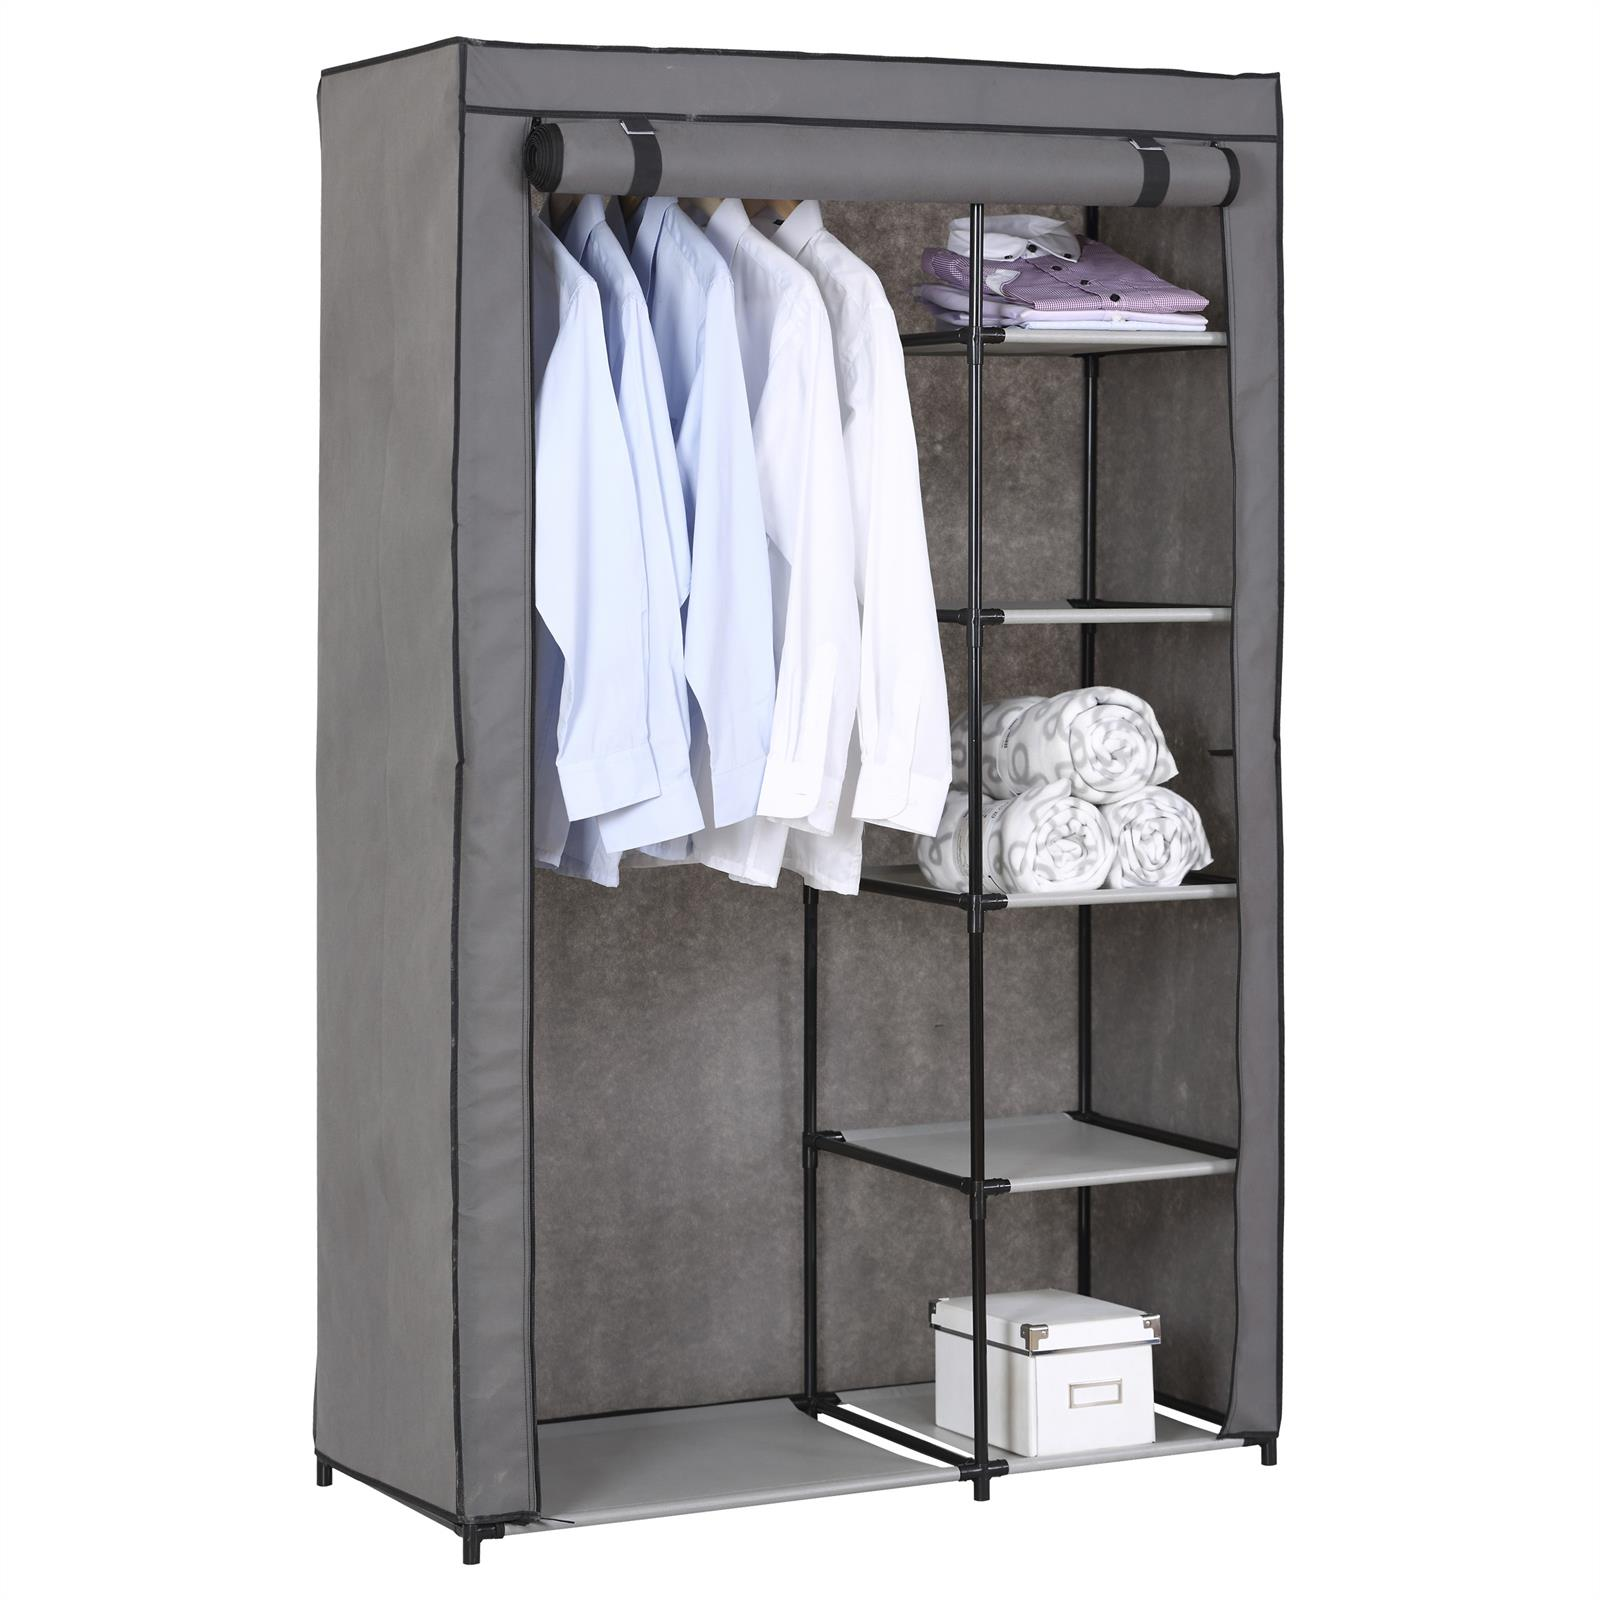 stoffkleiderschrank tanja mit kleiderstange mobilia24. Black Bedroom Furniture Sets. Home Design Ideas